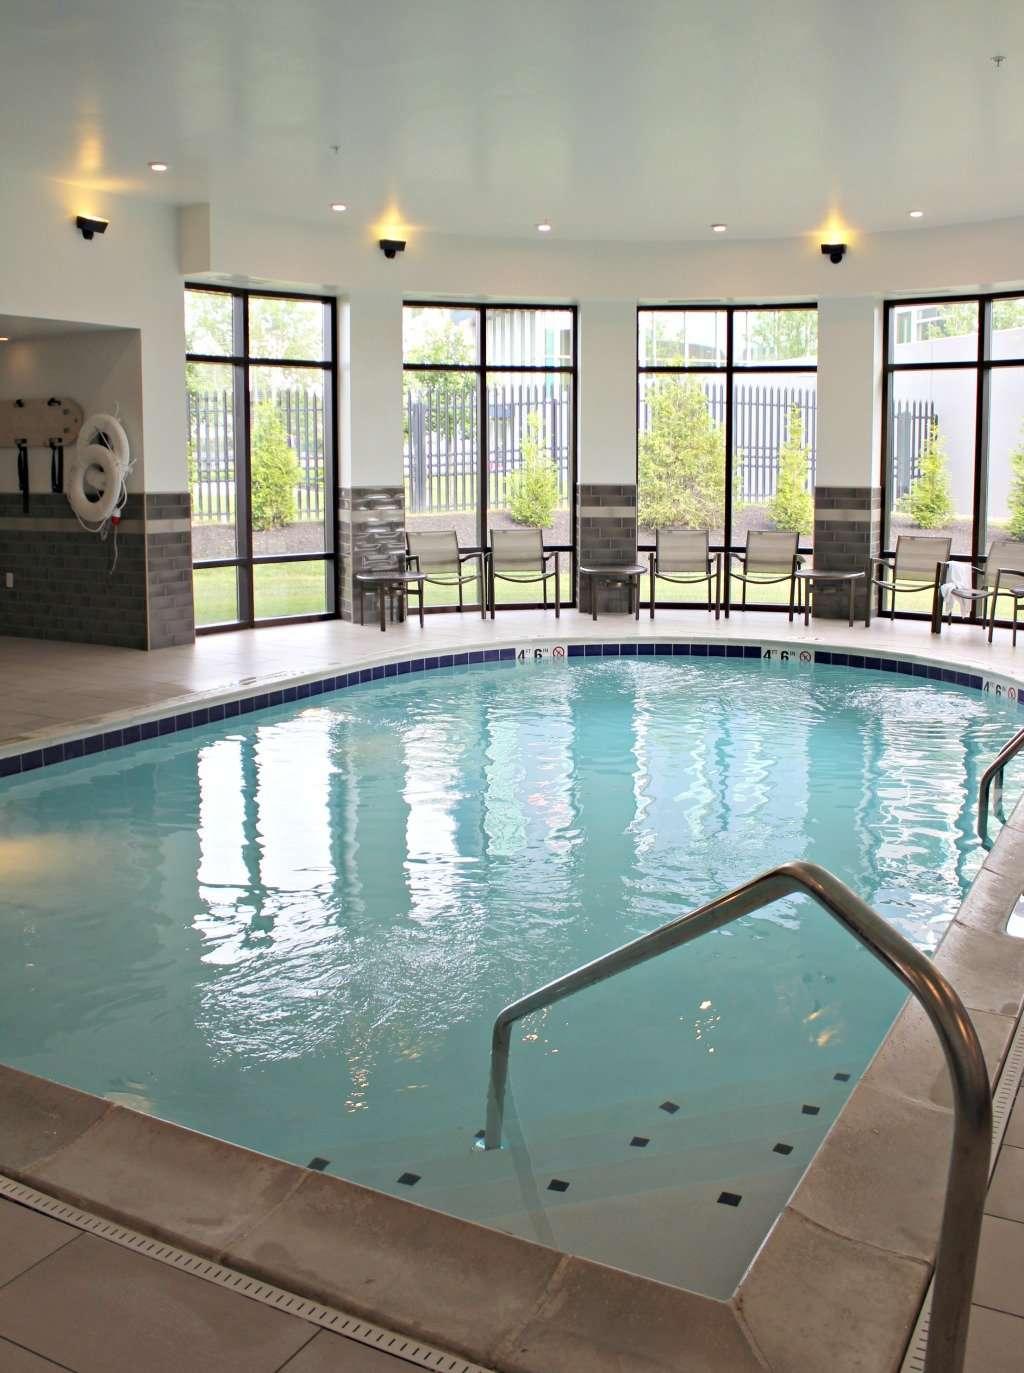 Hampton Inn Kenwood Is The Perfect Place to Stay in Cincinnati